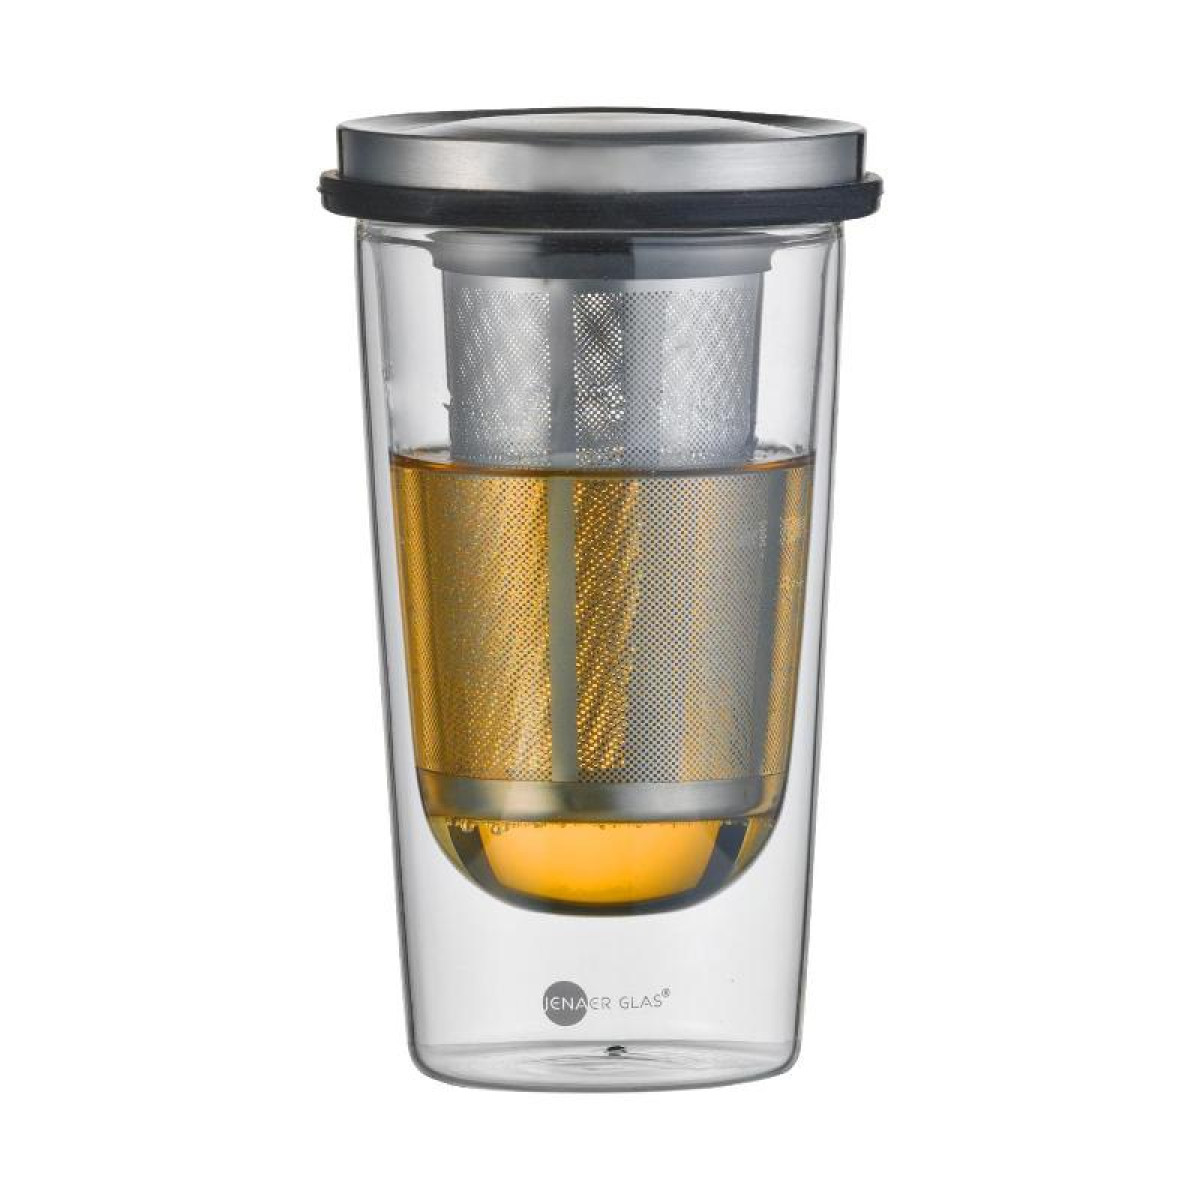 Онлайн каталог PROMENU: Стакан для заваривания чая с фильтром Jenaer Glas FOOD AND DRINKS, объем 0,35 л, прозрачный Jenaer Glas 116576